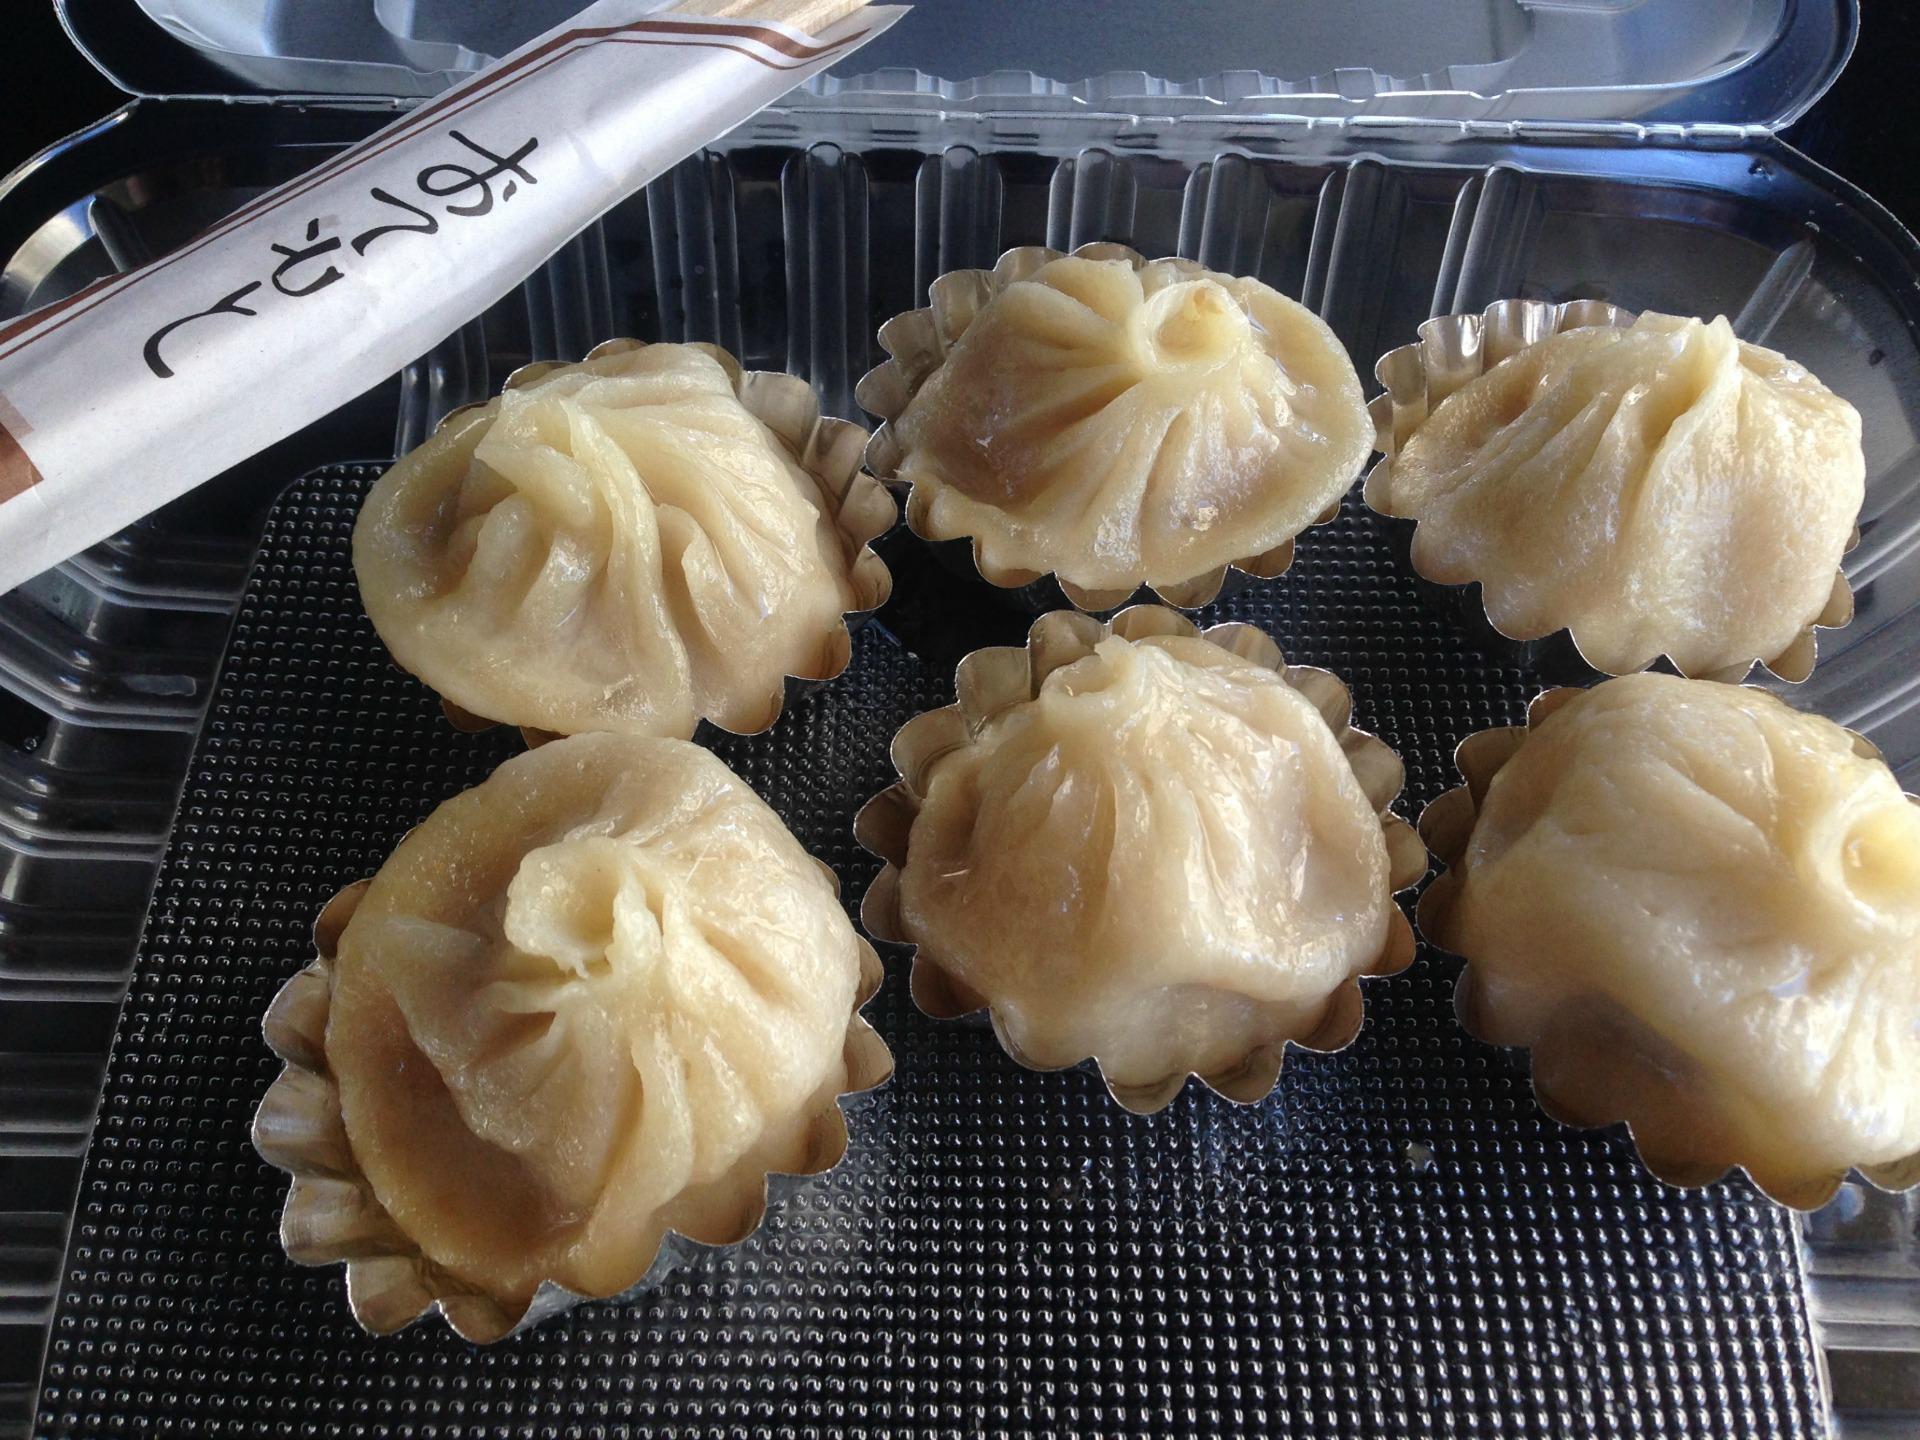 Soup dumplings from Berkeley's Dumpling Express.